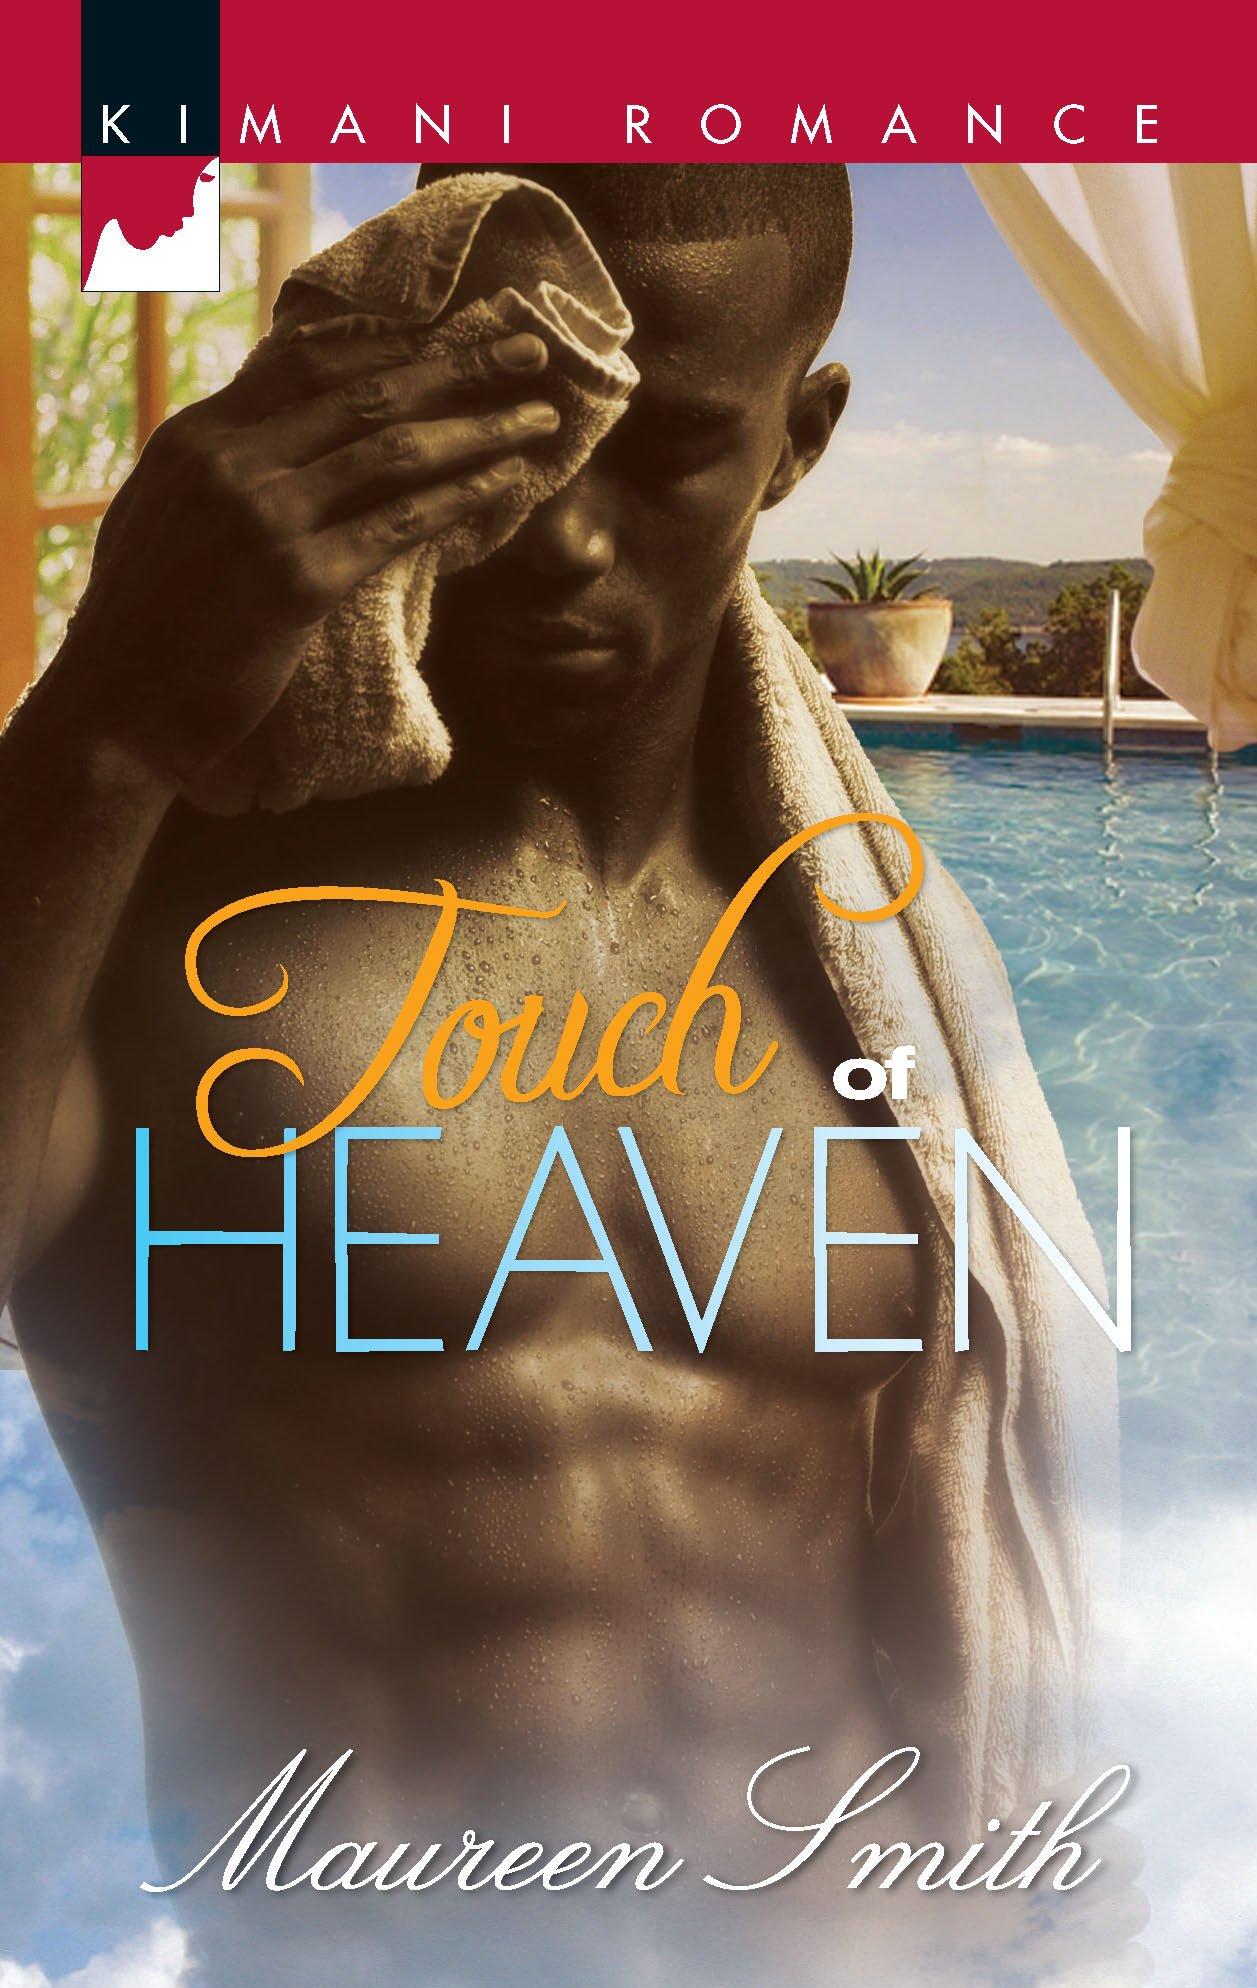 Amazon.com: Touch of Heaven (Kimani Romance) (9780373861354): Maureen  Smith: Books